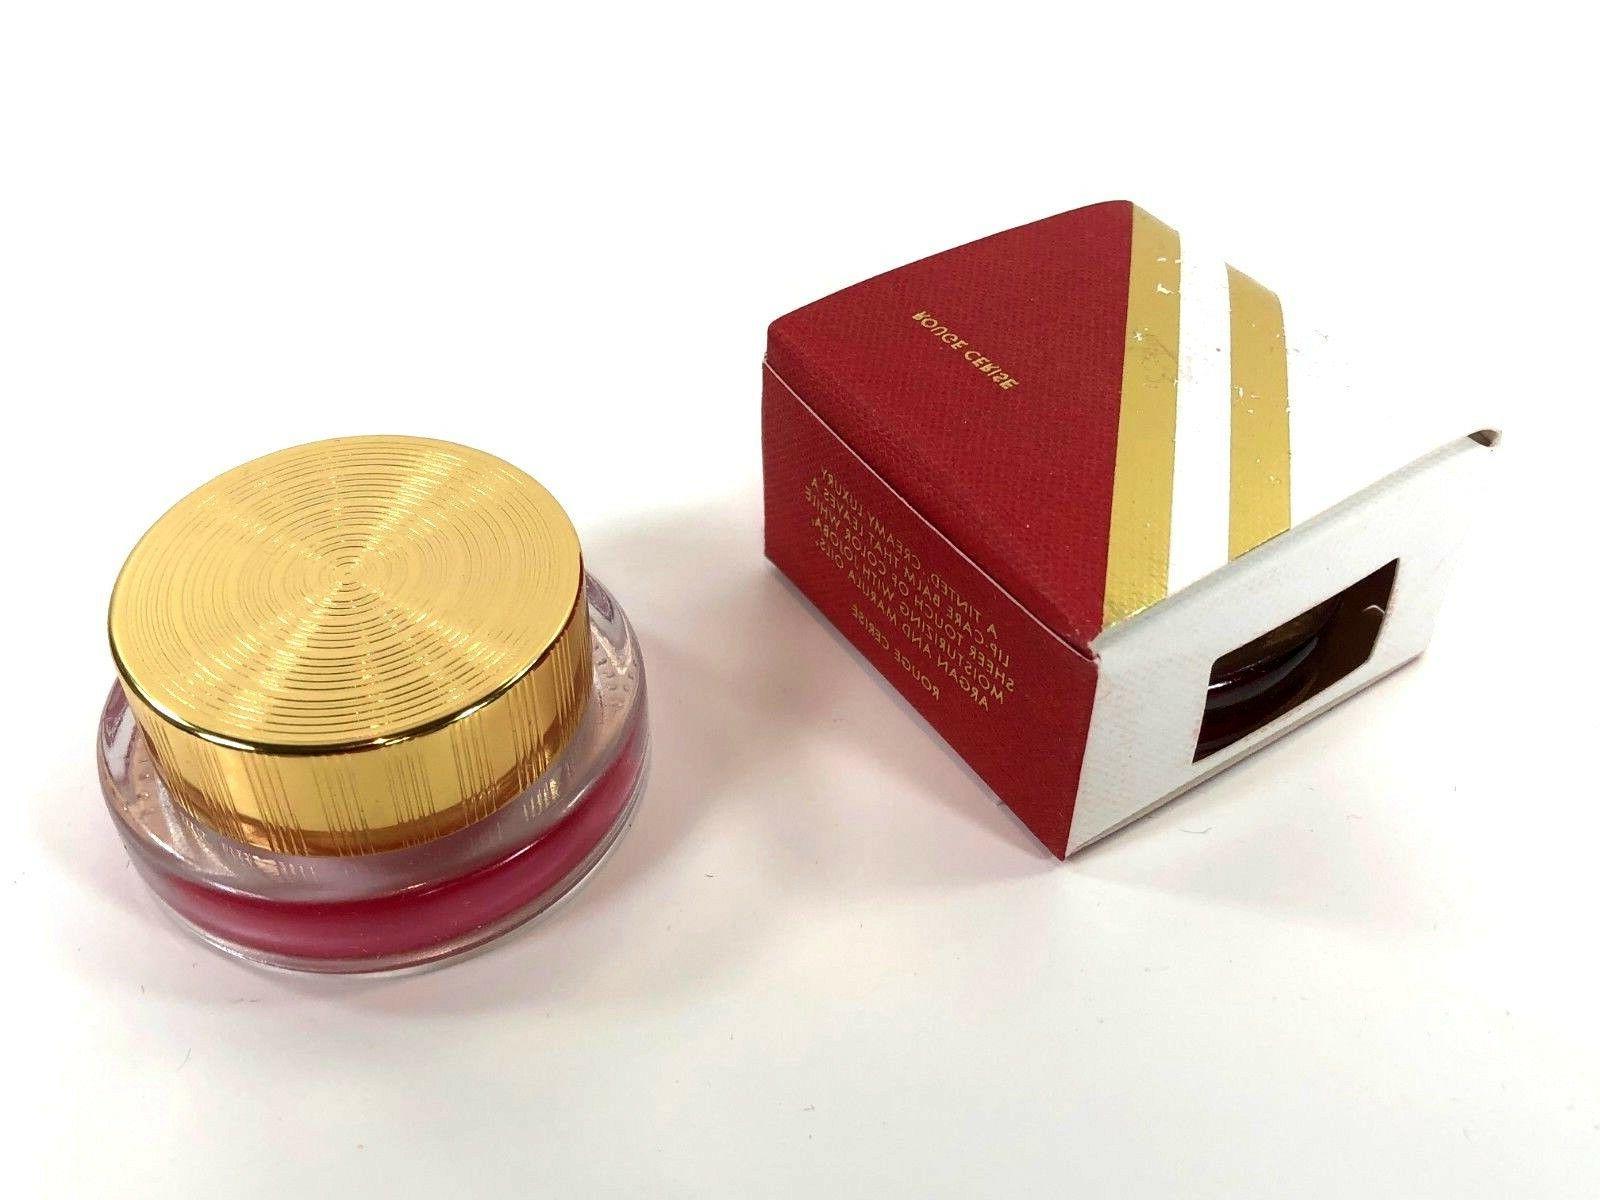 New Nourishing Cerise Tinted Lip Balm Full Size 8g